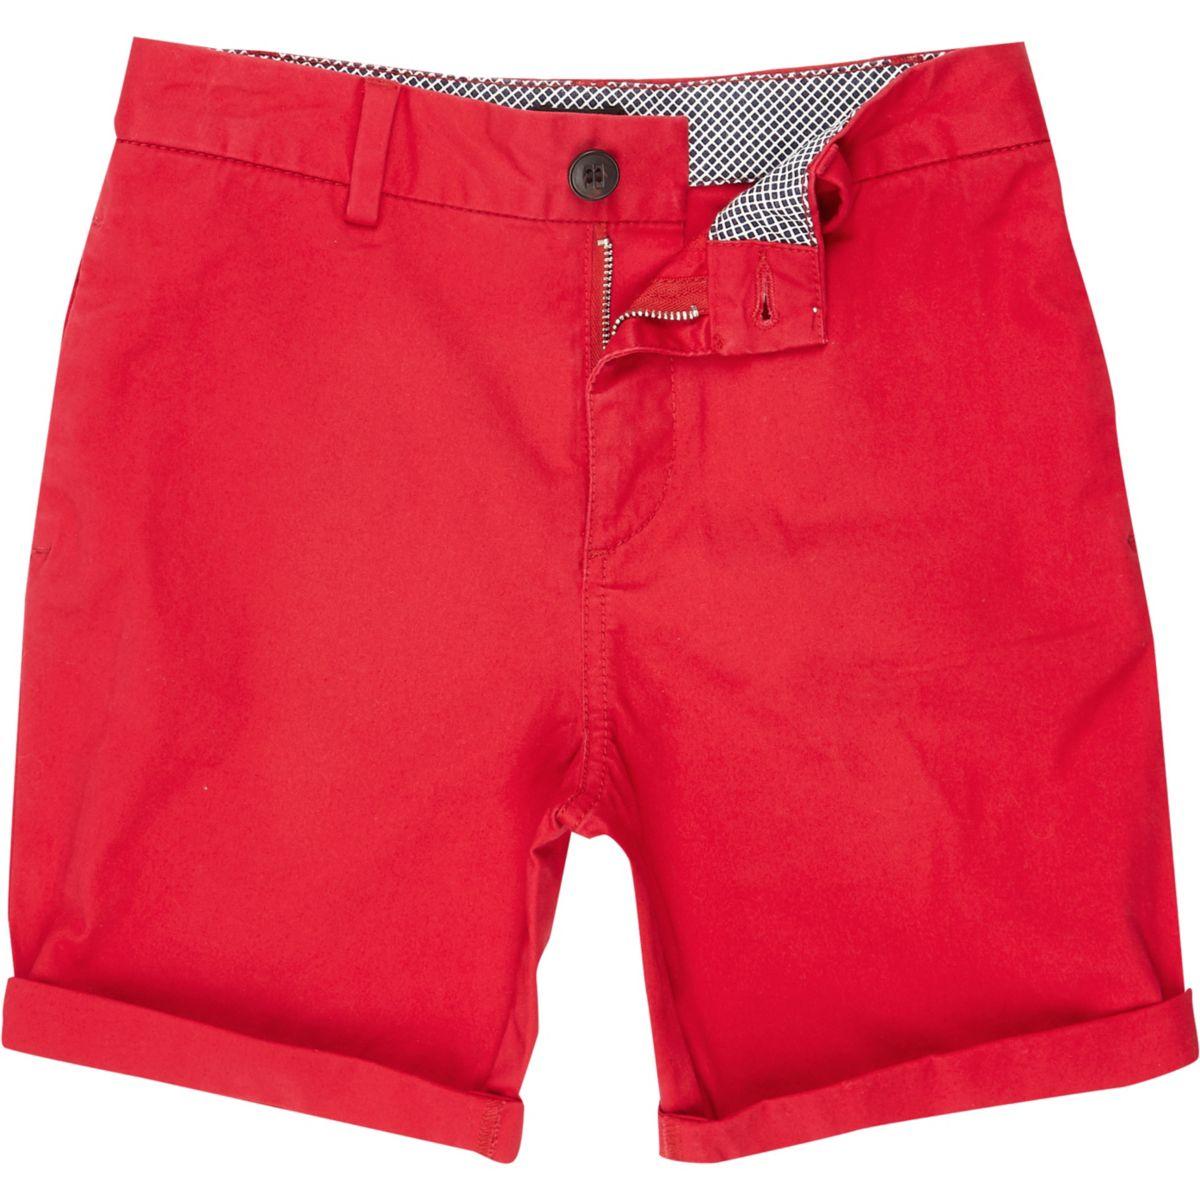 Boys red chino shorts